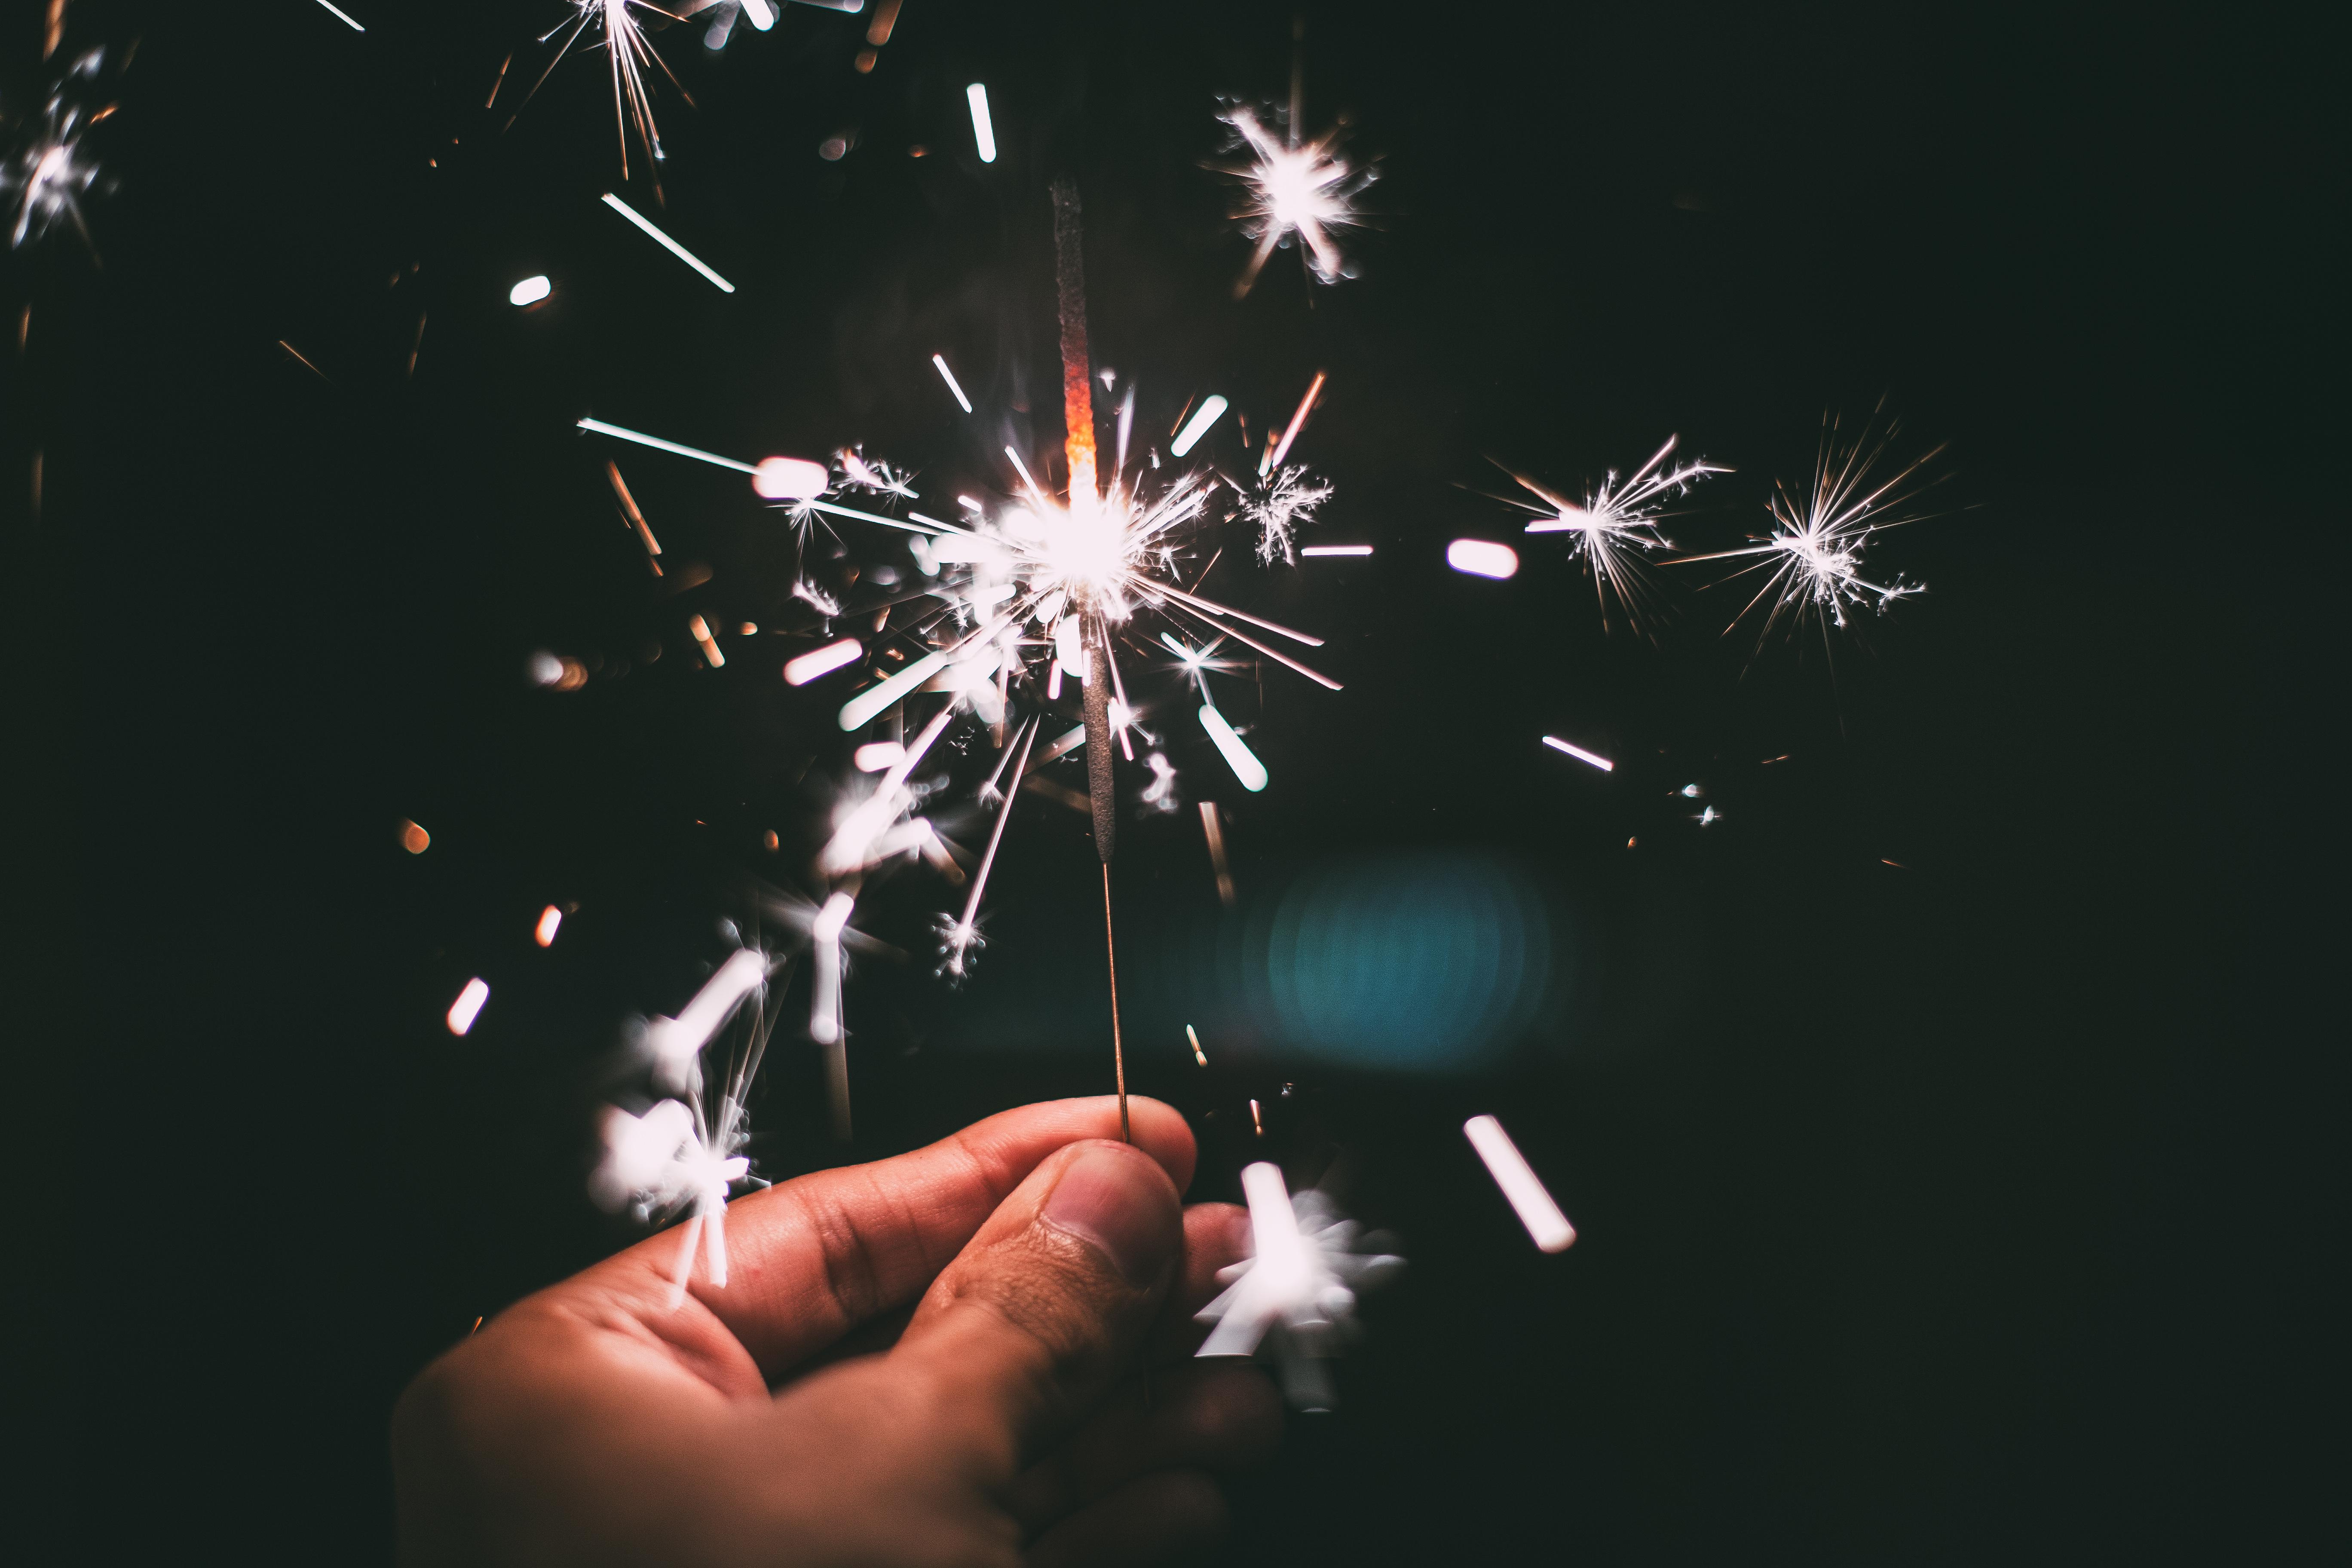 Kullakeks - Gute Vorsätze - Neujahr - Wunderkerze